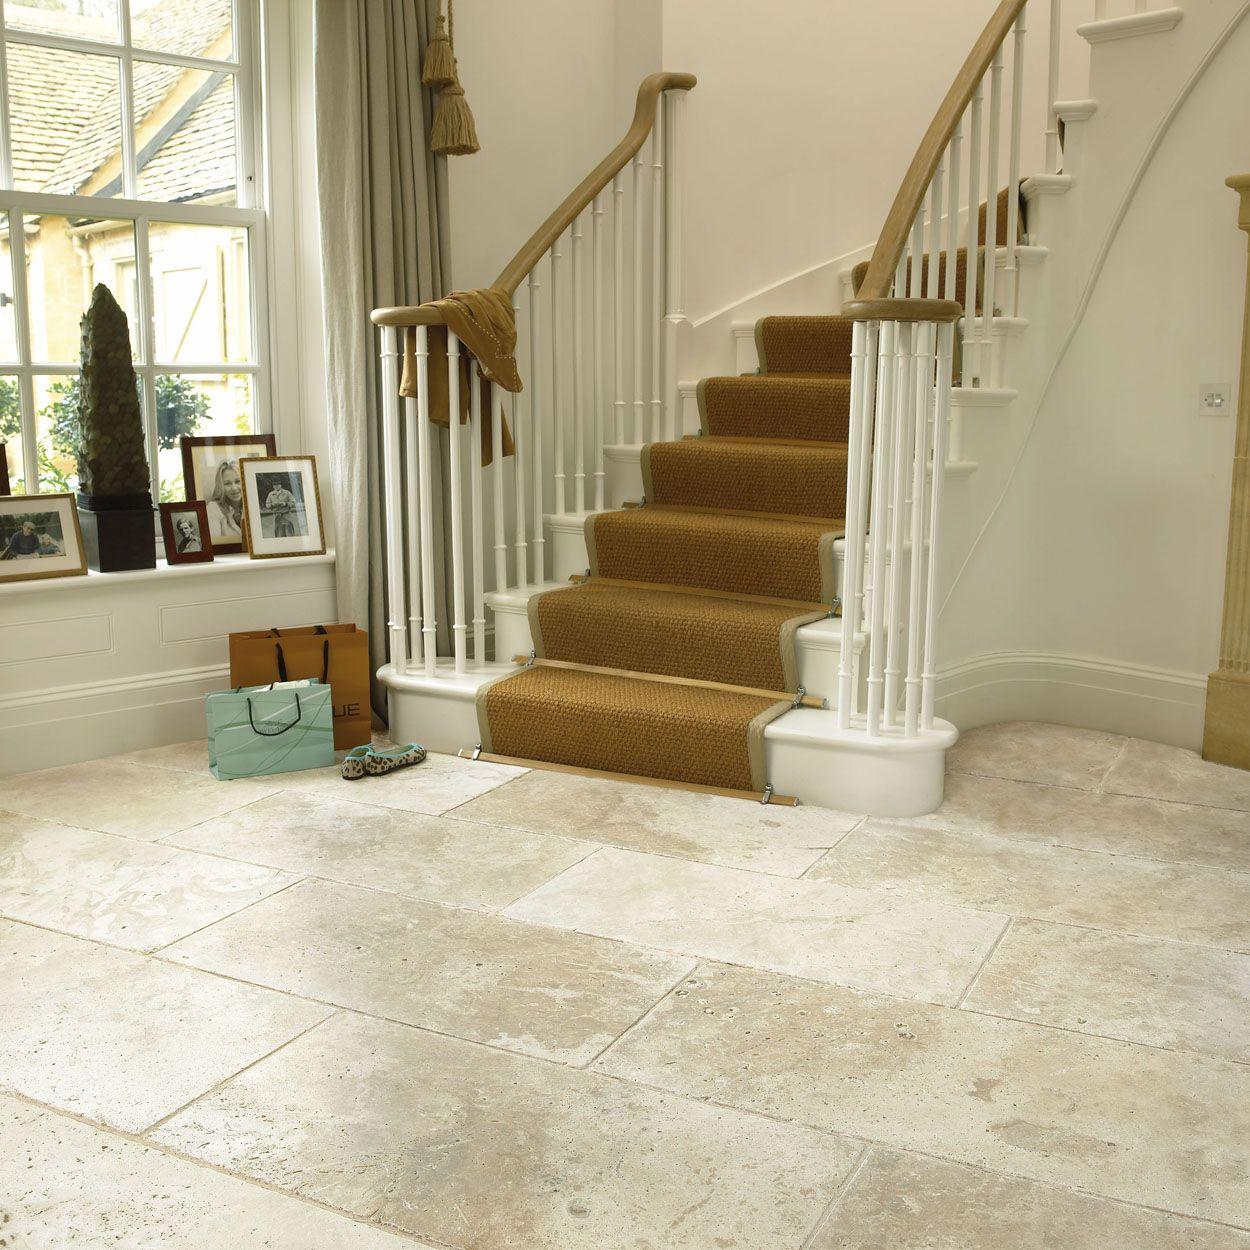 Classical Flagstones Savannah White Travertine Tiles Tumbled